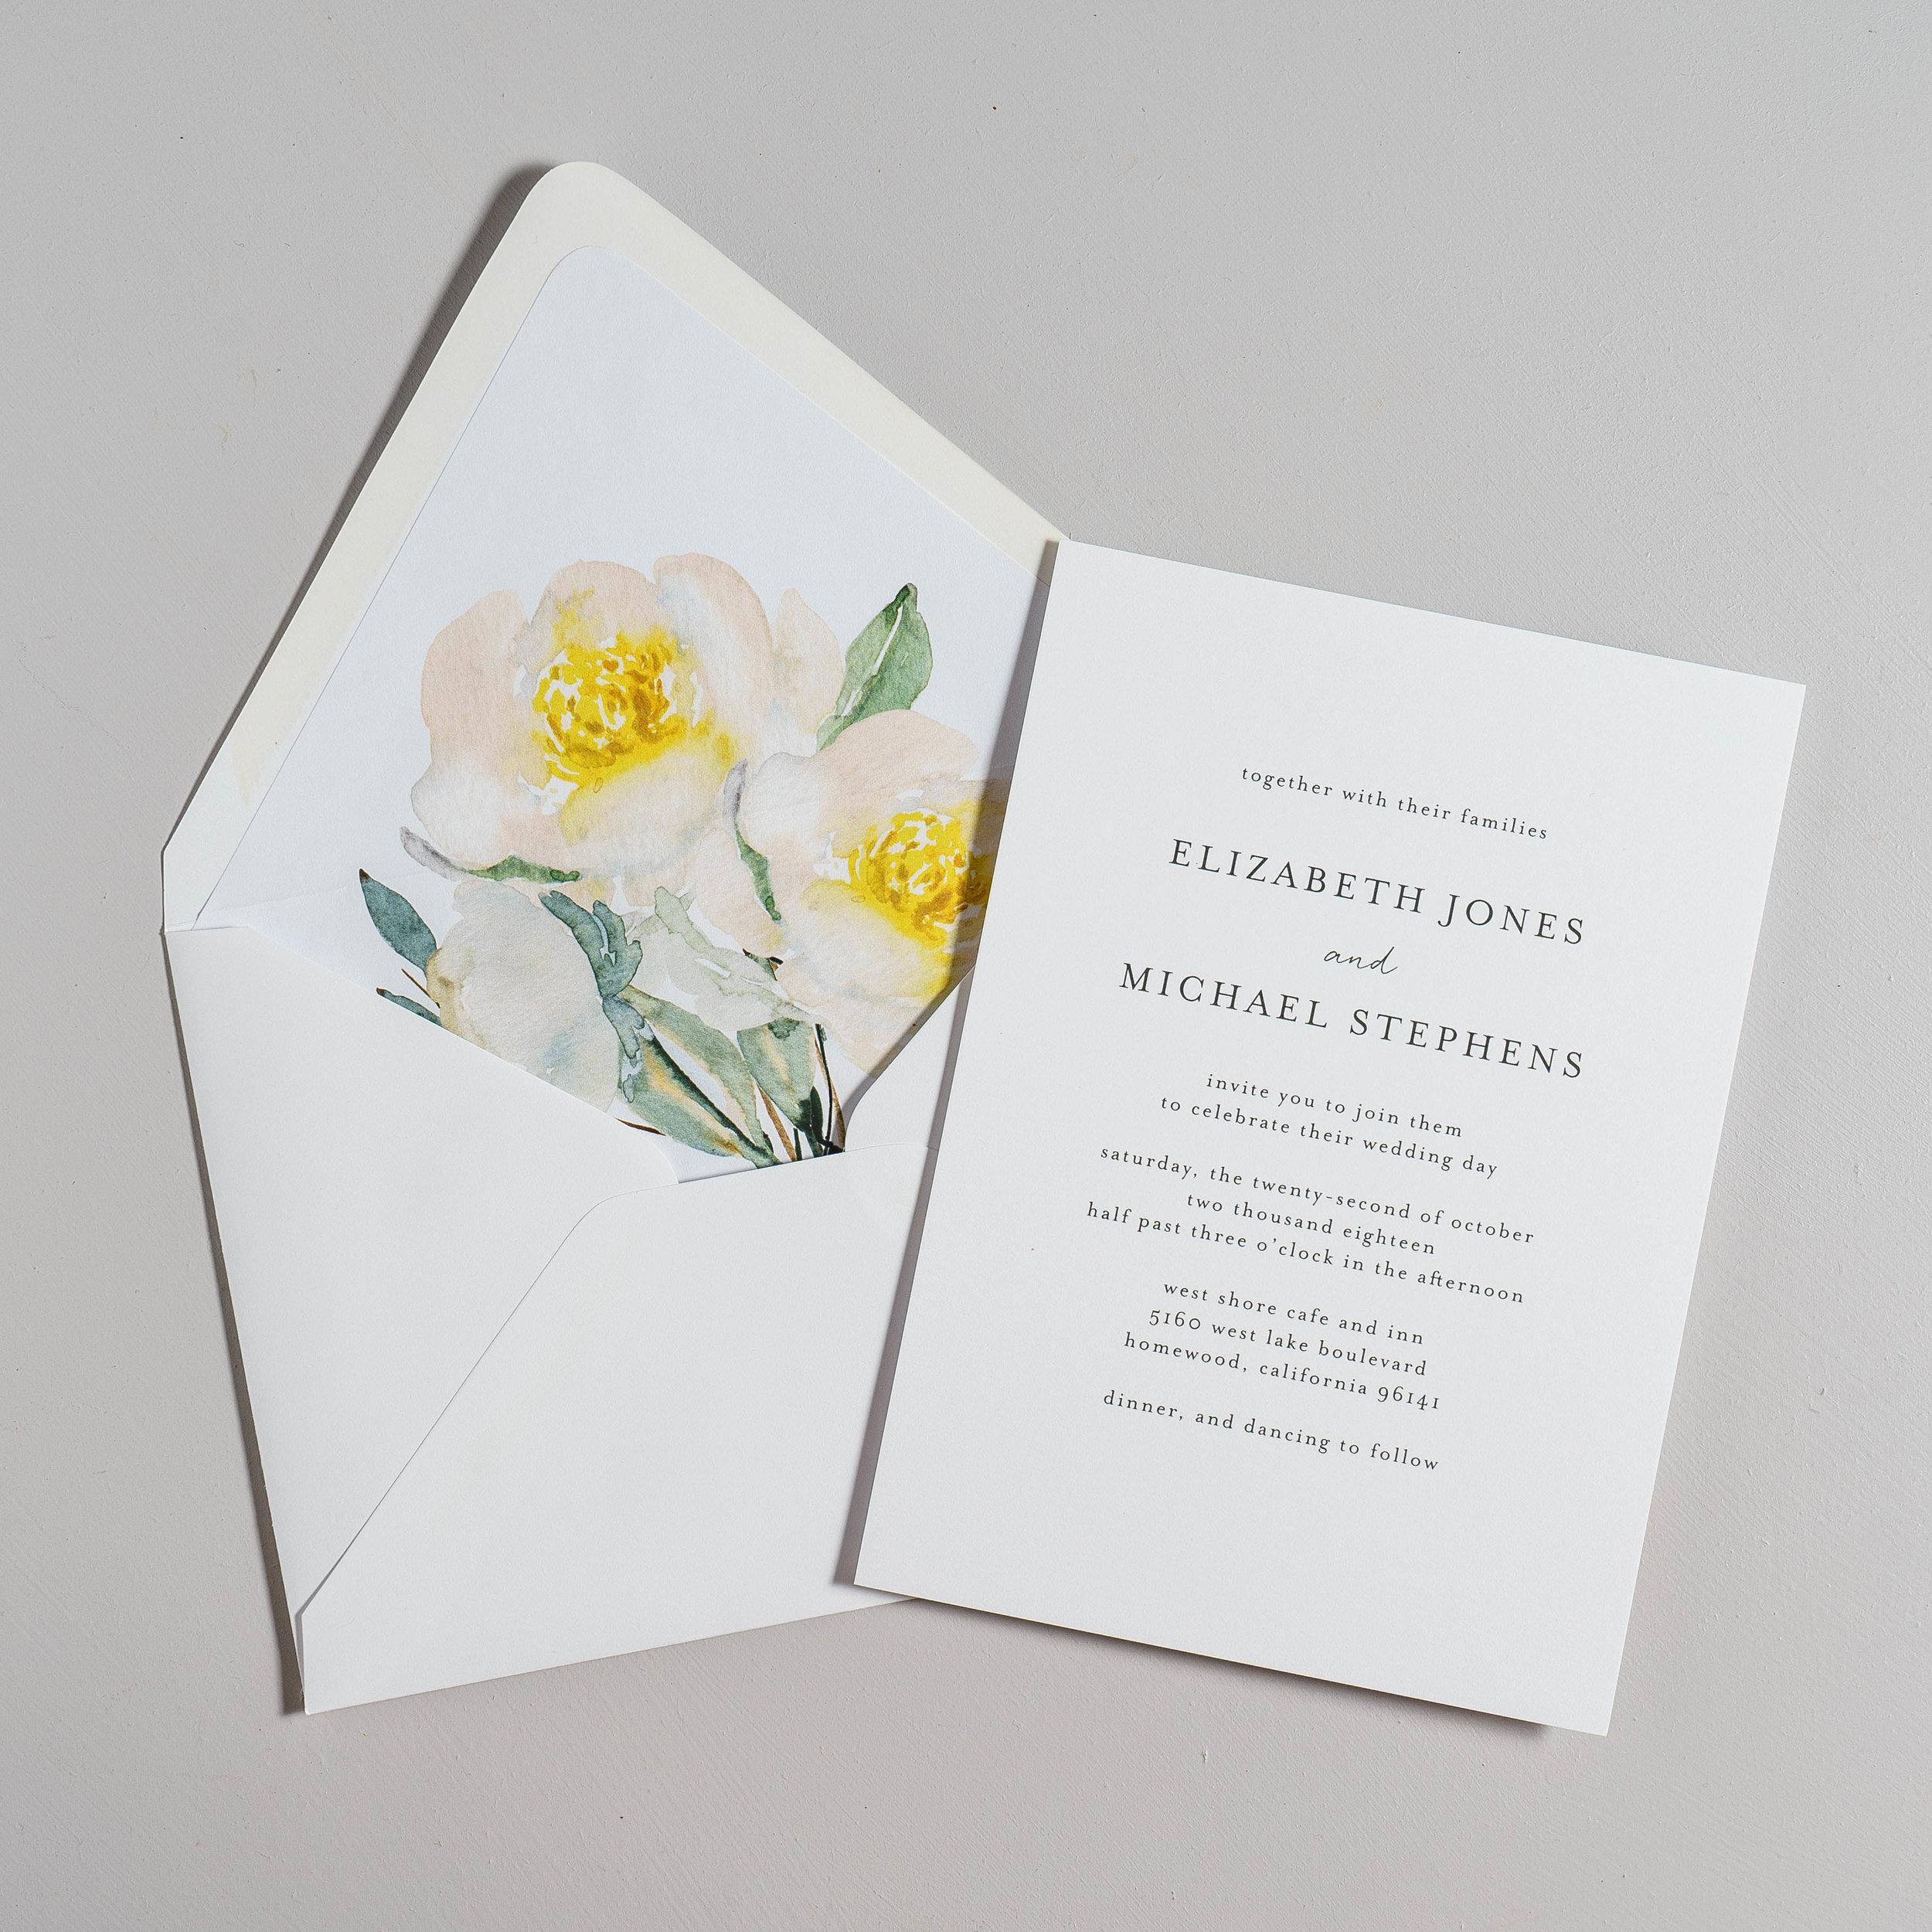 Botanical Minimalist V2 Wedding Invitations by Just Jurf-5.jpg